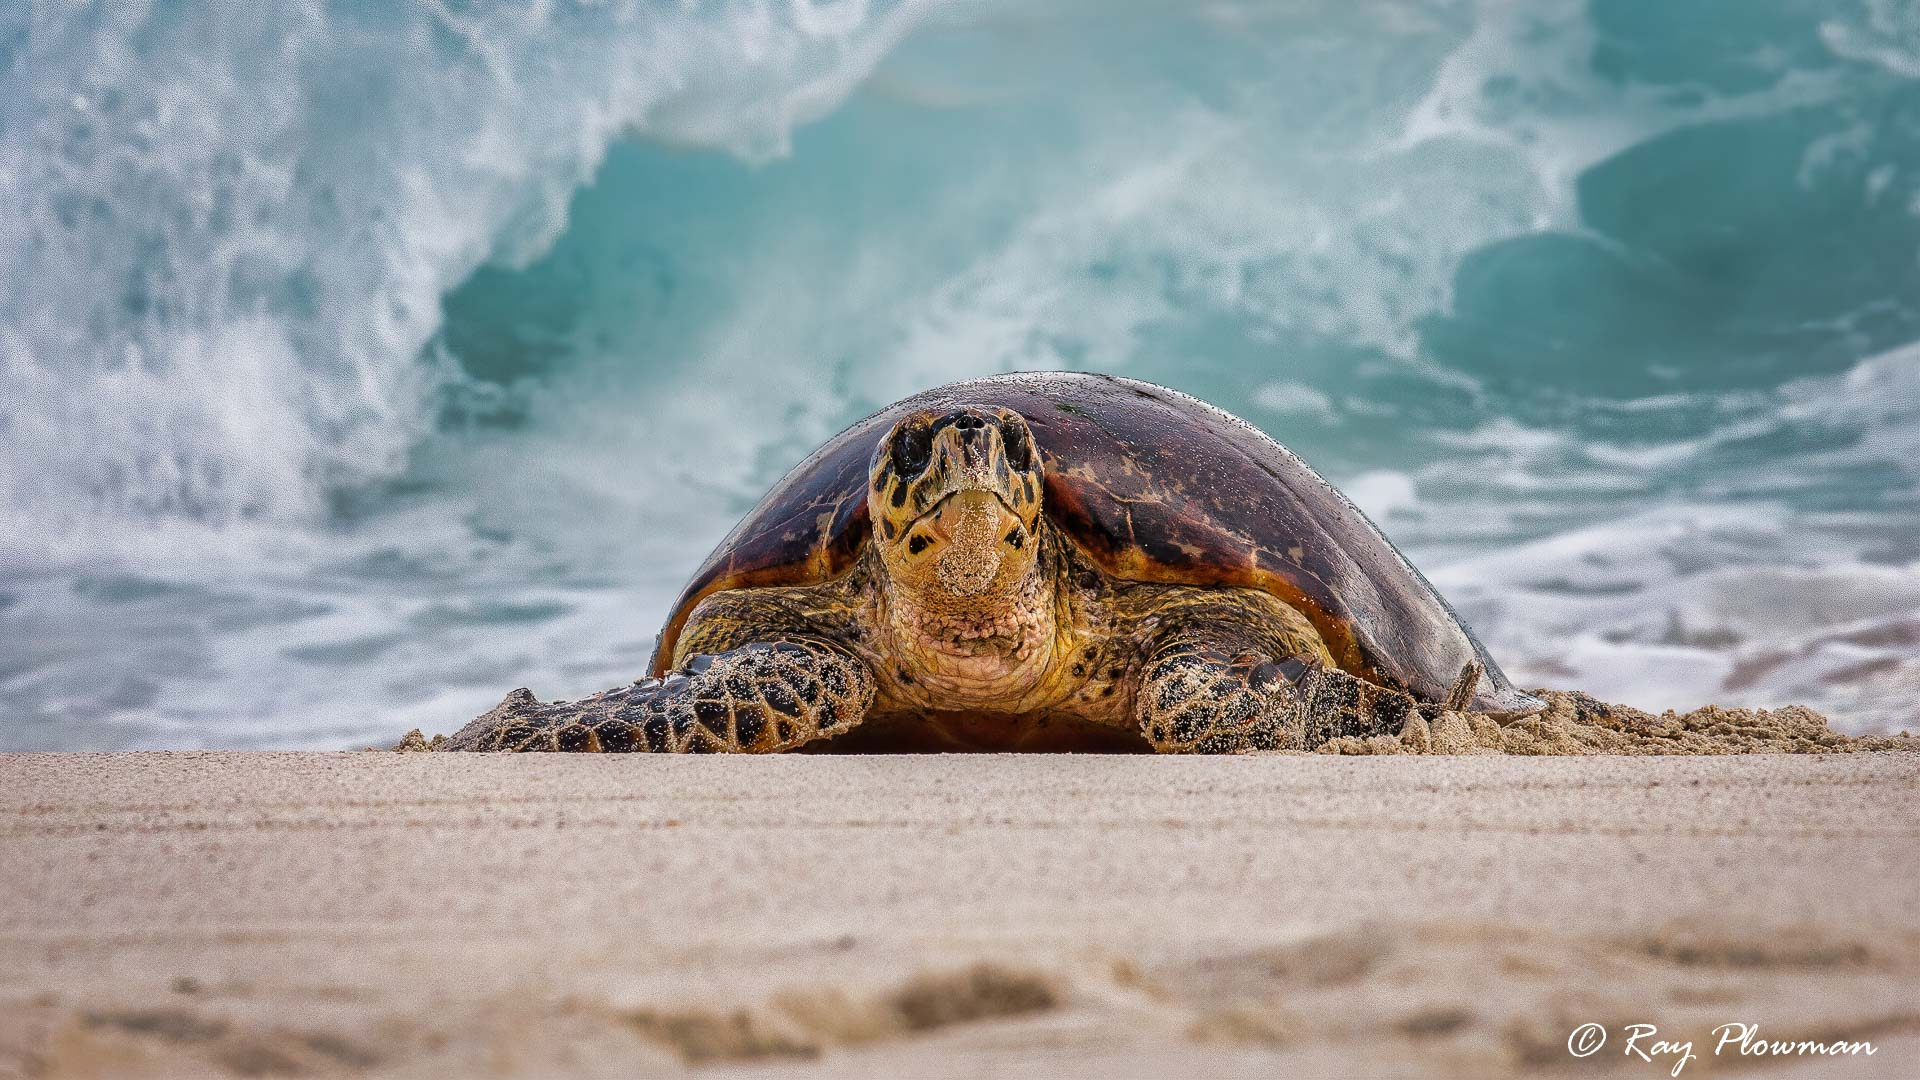 Hawksbill Turtle (Eretmochelys imbricata) coming ashore at the east end of Mahé Islands Anse Bazarca beach